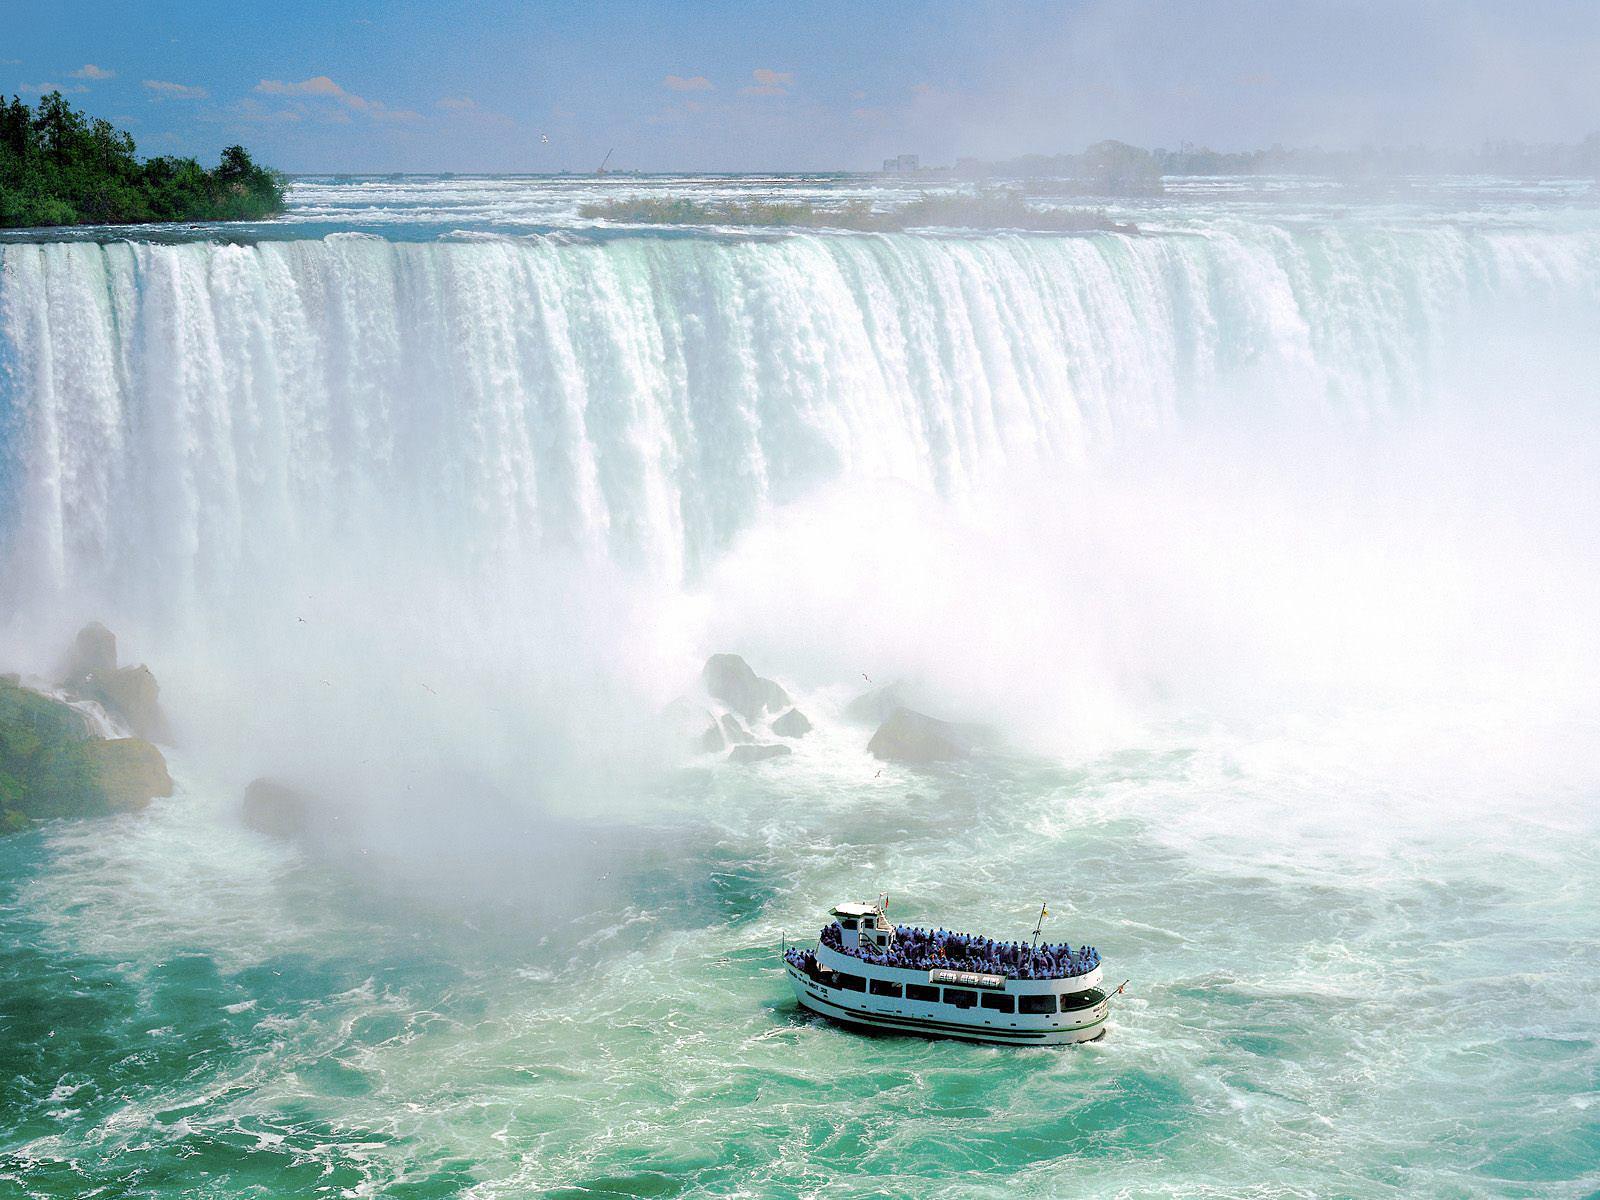 http://4.bp.blogspot.com/-uuh6Y71KAdk/T29AbjNKbNI/AAAAAAAAAIs/cPZjgPzuAGc/s1600/Best-top-desktop-waterfalls-wallpapers-hd-waterfall-wallpaper-beautiful-picture-1.jpg